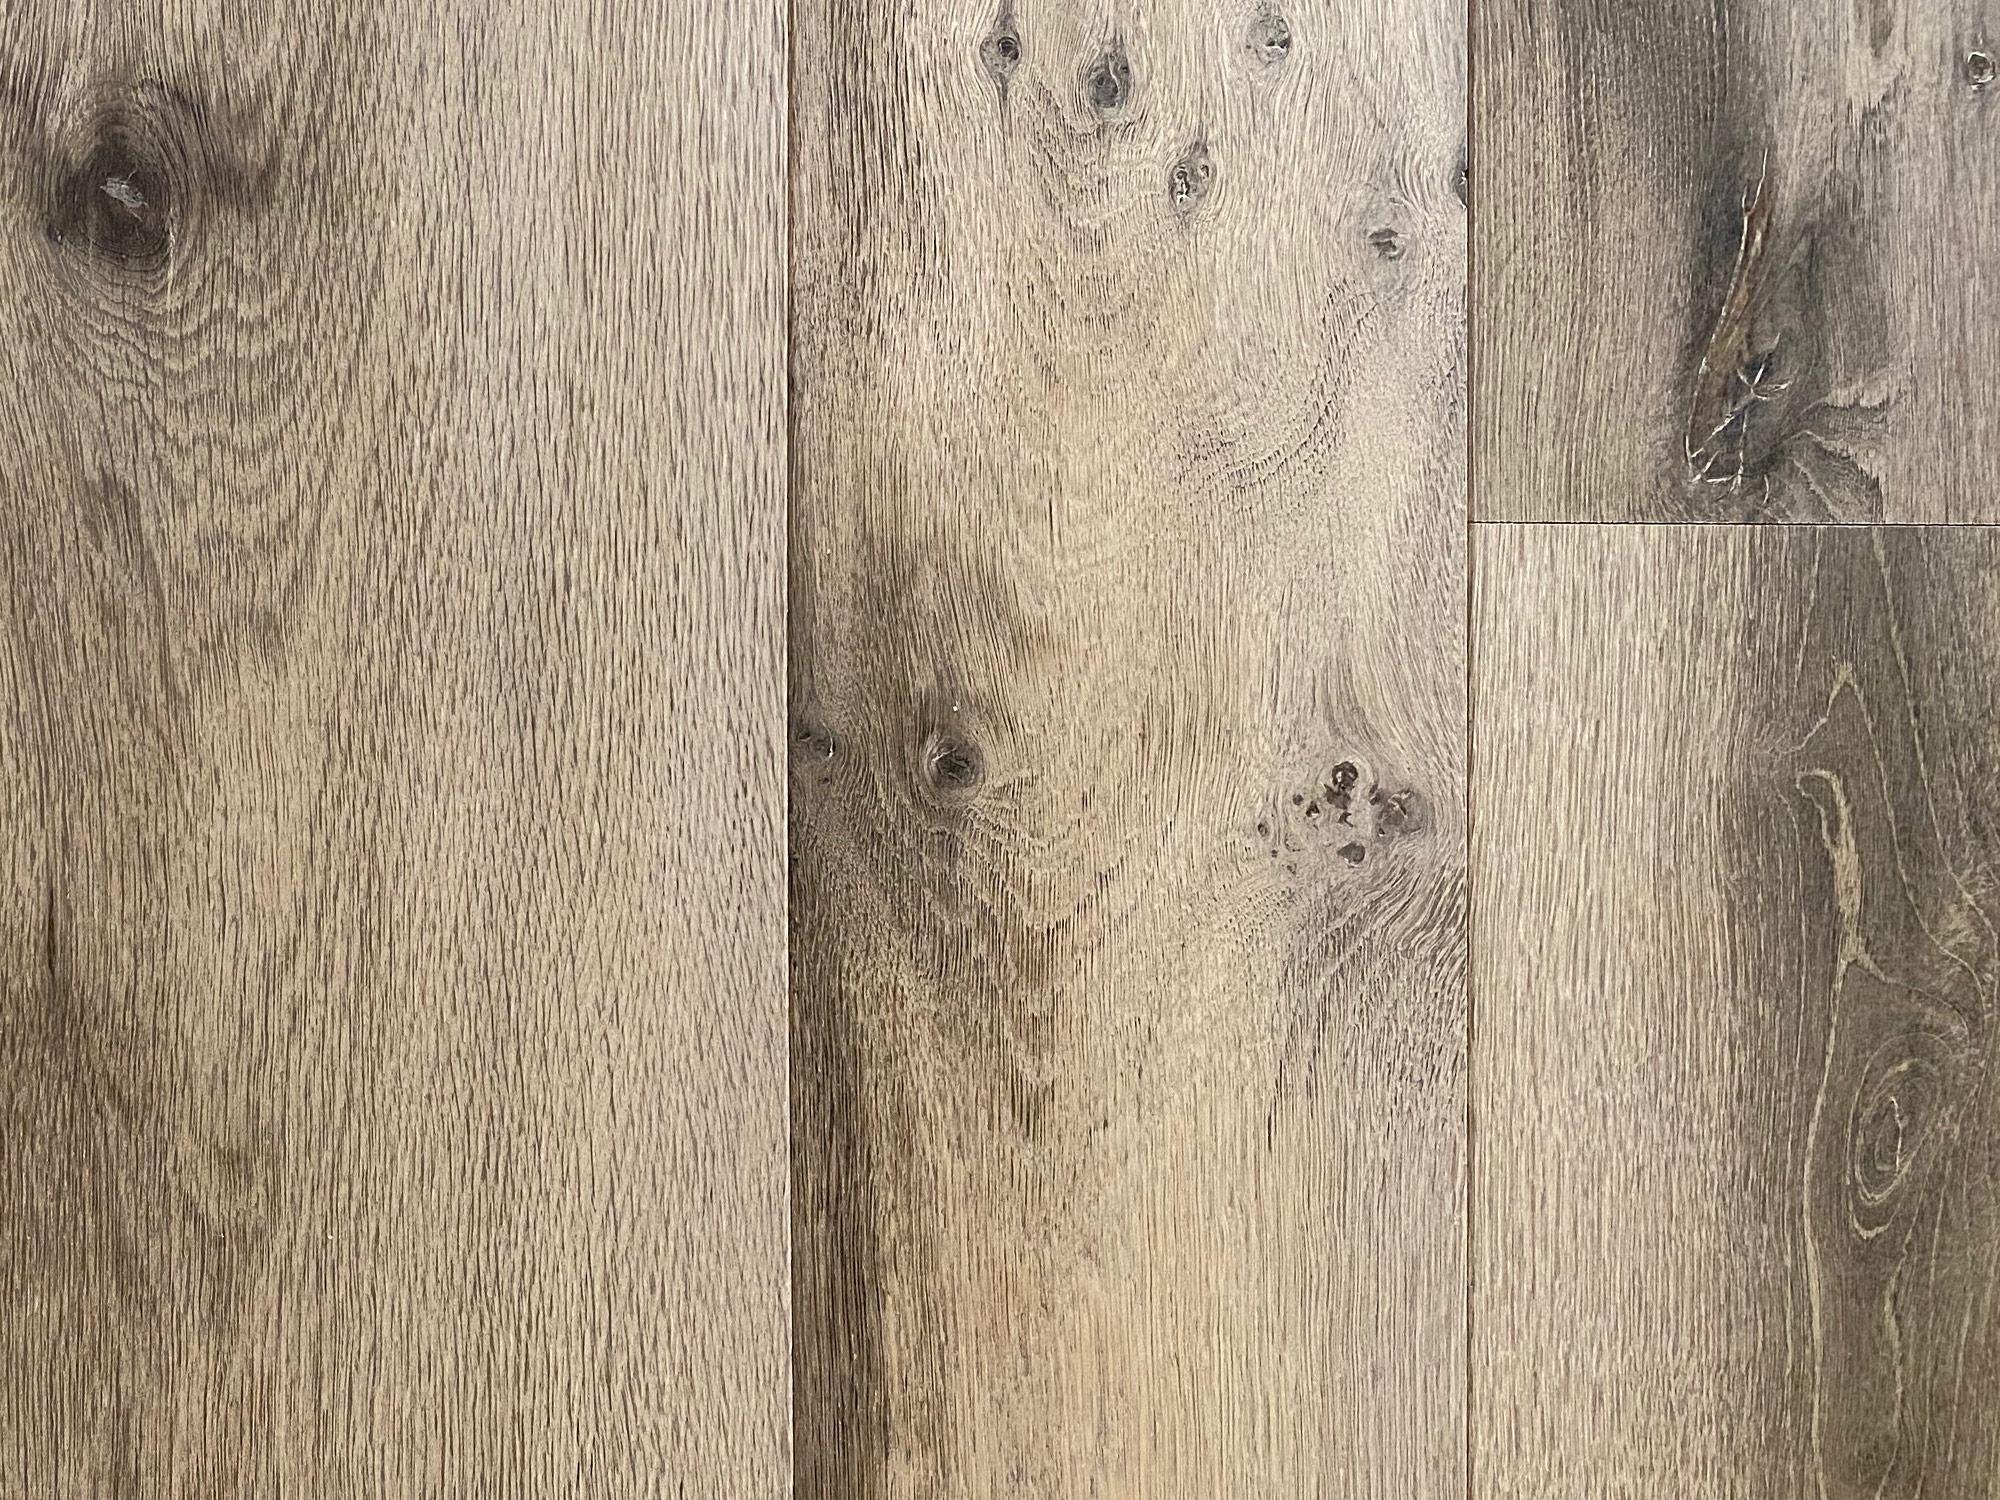 Knots on engineered grey oak flooring